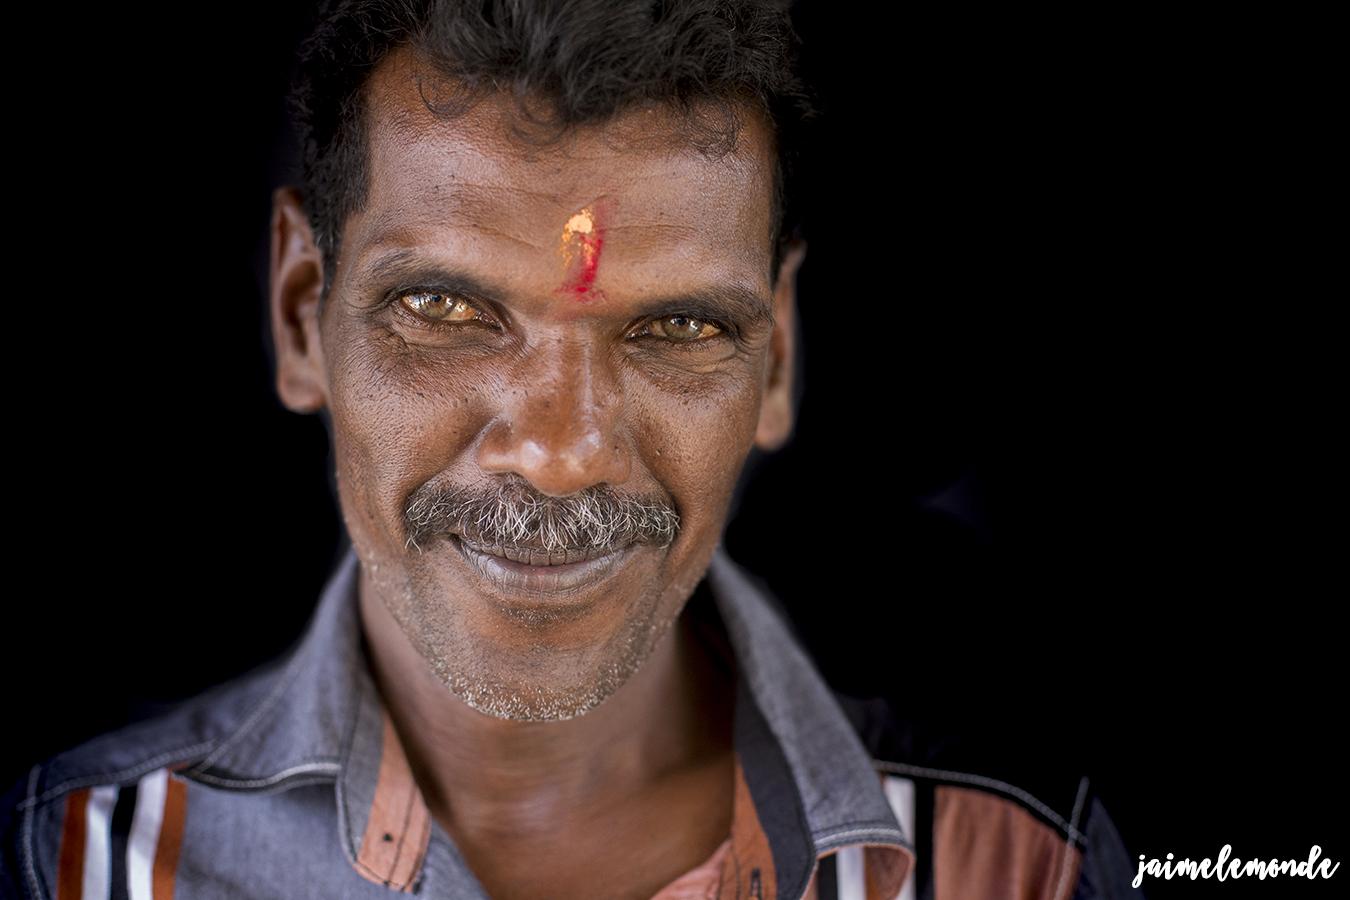 Portraits de voyage au Sri Lanka ©jaimelemonde (7)